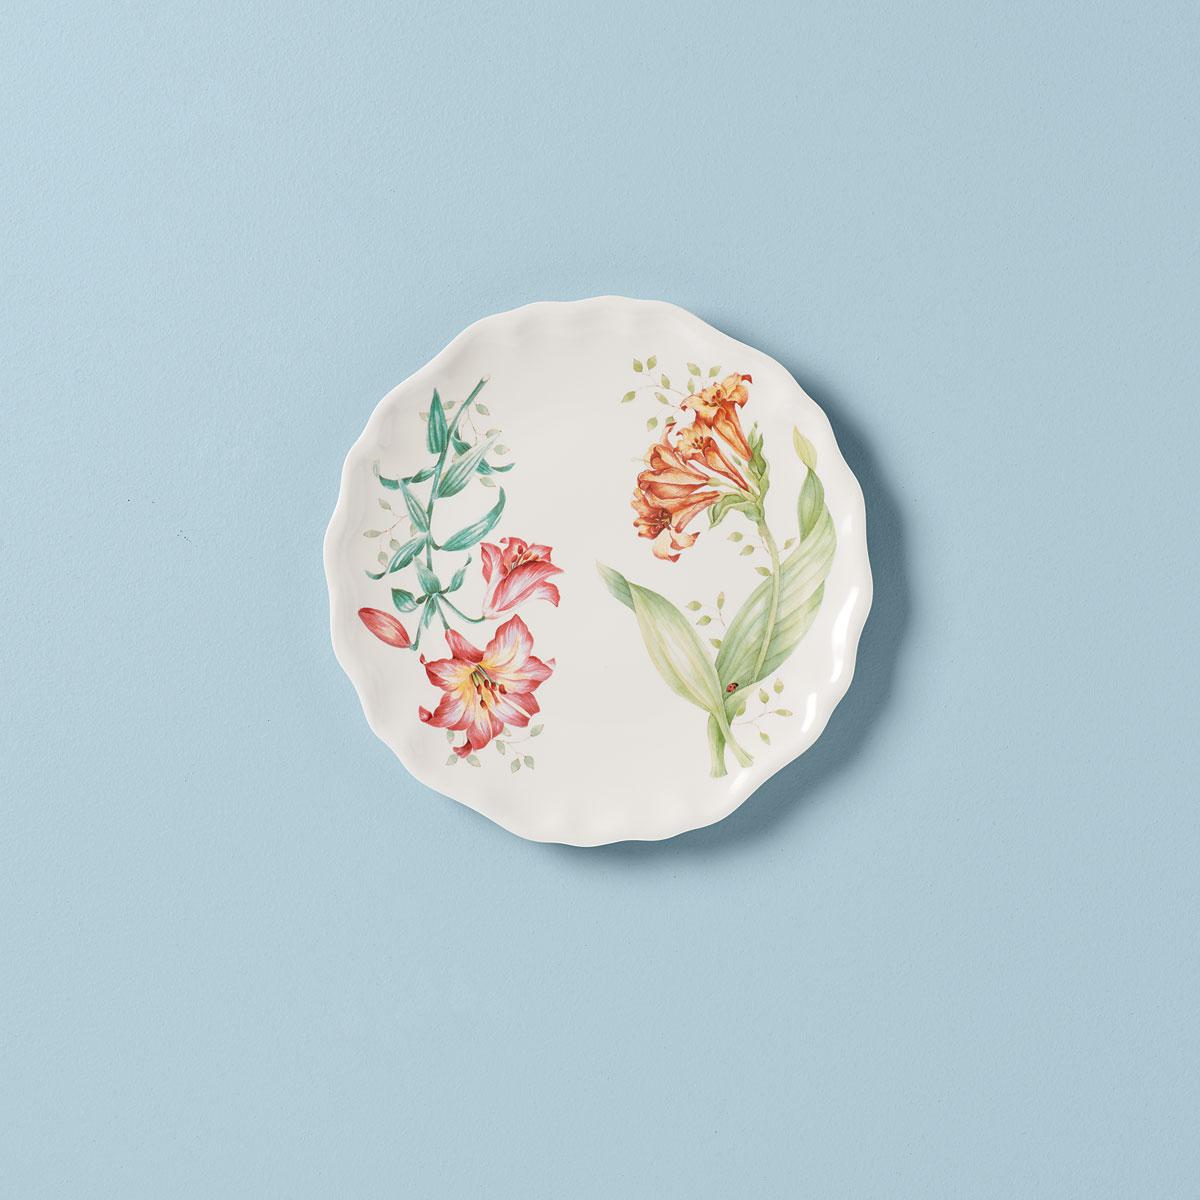 Lenox Butterfly Meadow Melamine Dinnerware Accent Plate